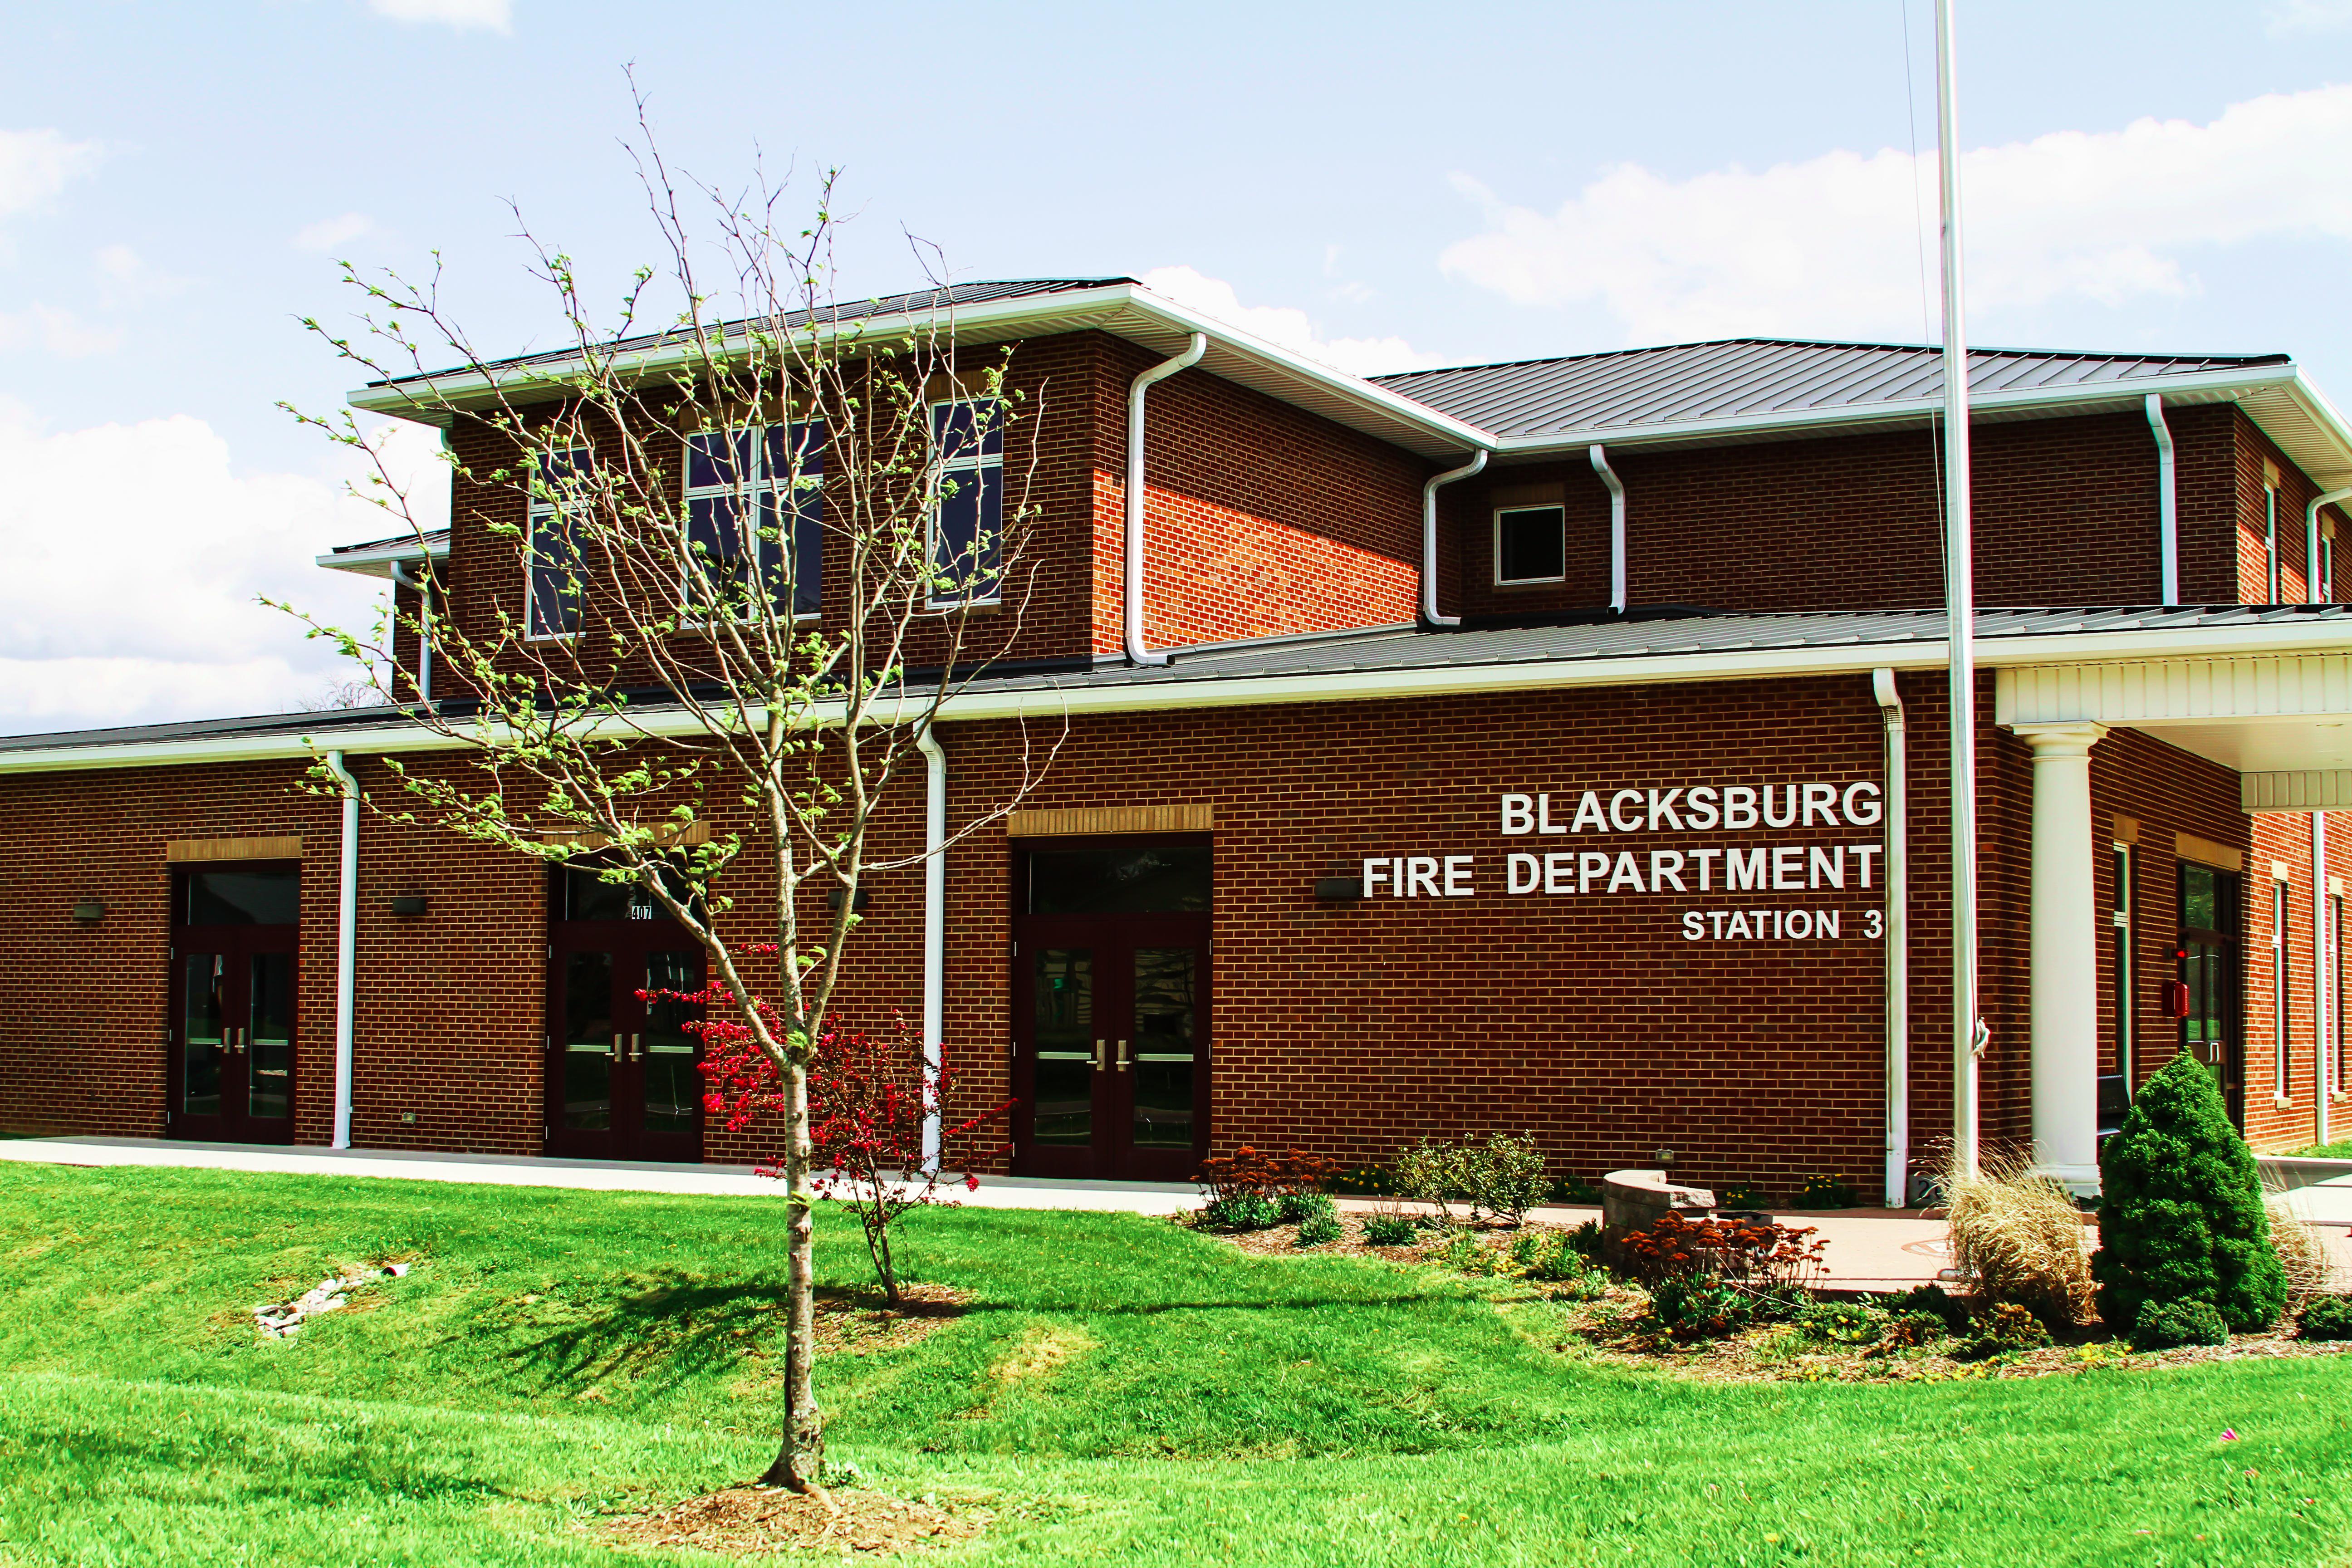 Blacksburg Fire Department